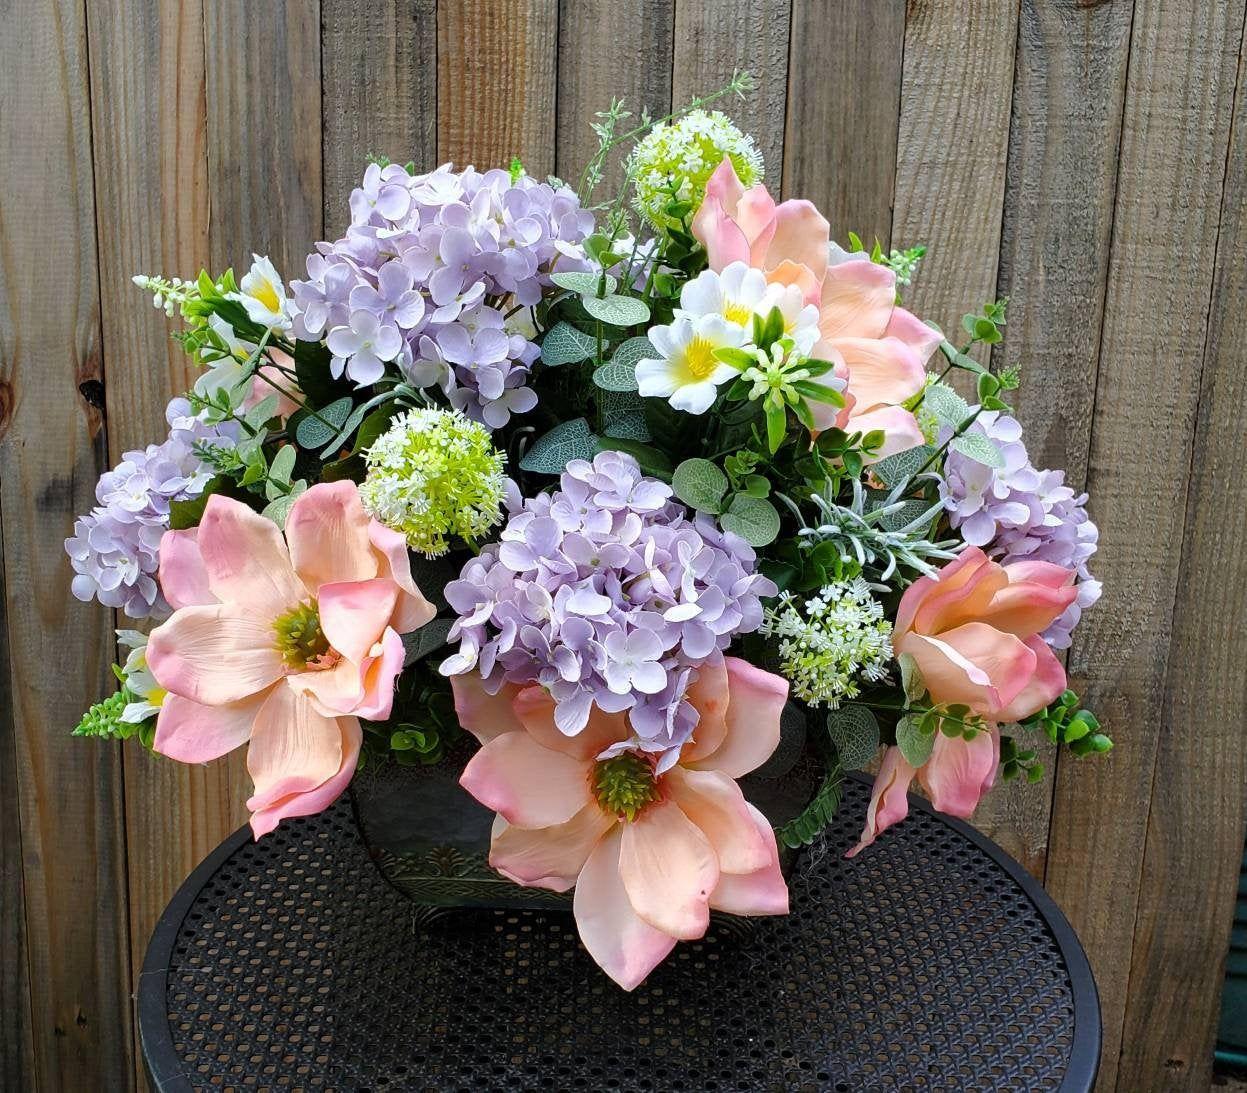 Hydrangea And Magnolia Centerpiece For Dining Table Summer Etsy In 2020 Magnolia Centerpiece Hydrangea Purple Summer Hydrangeas